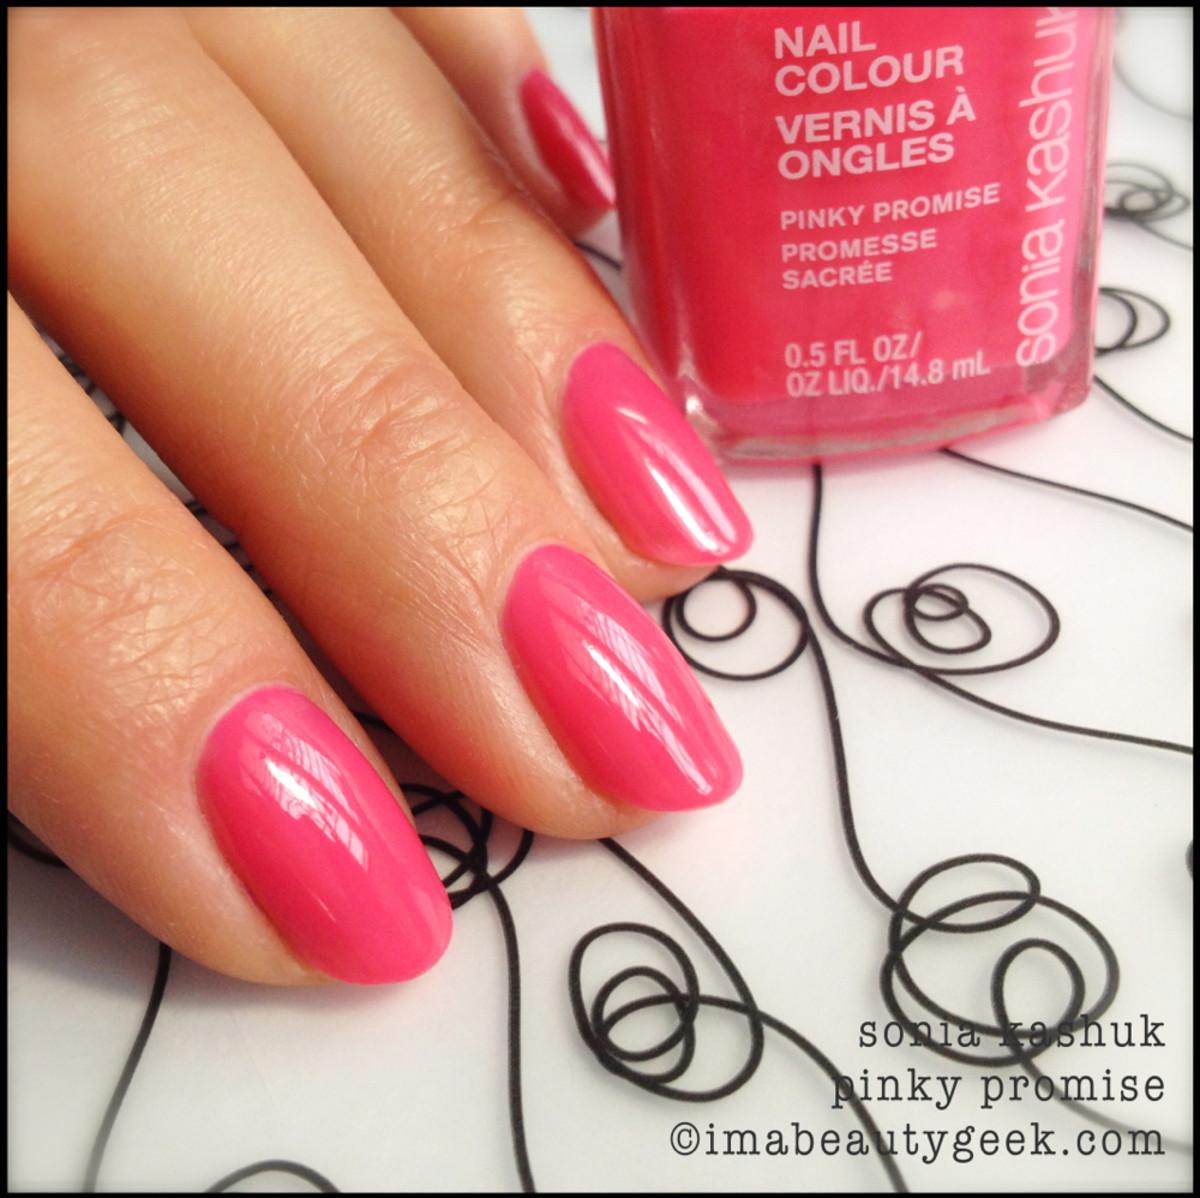 Sonia Kashuk Pinky Promise_Sonia Kashuk nail polish Spring 2014